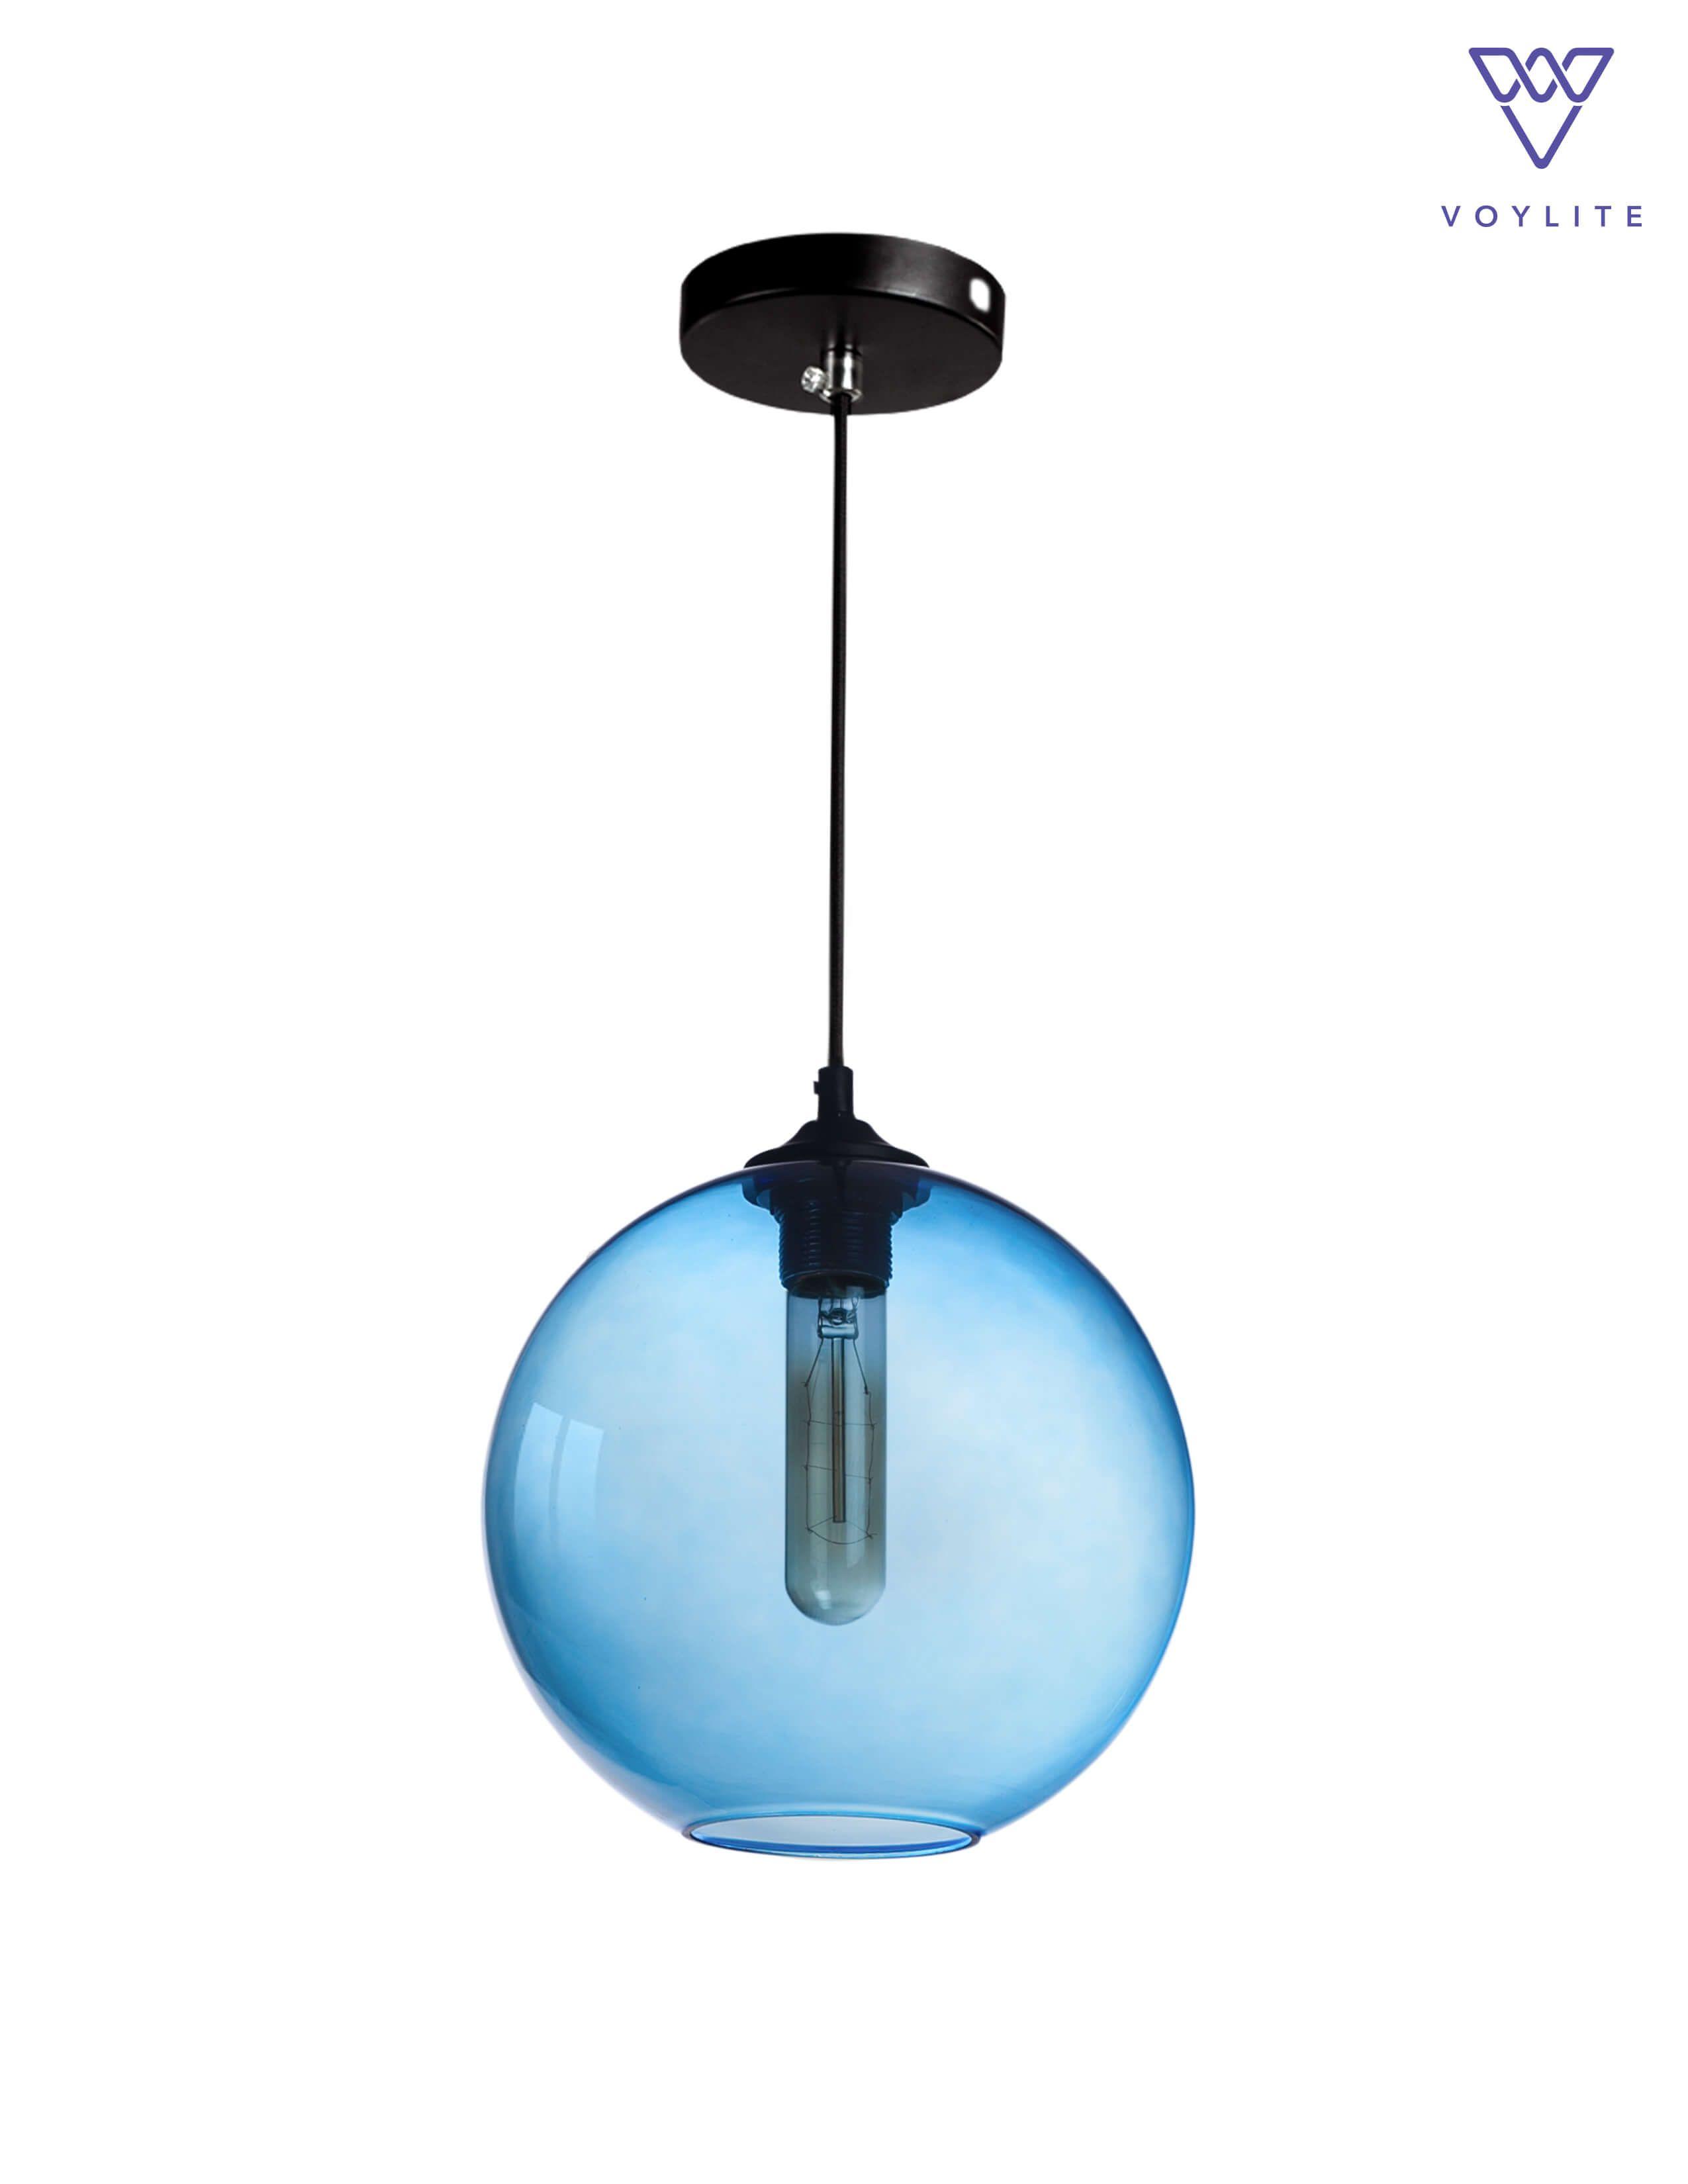 Ethereal Blue Globe Pendant